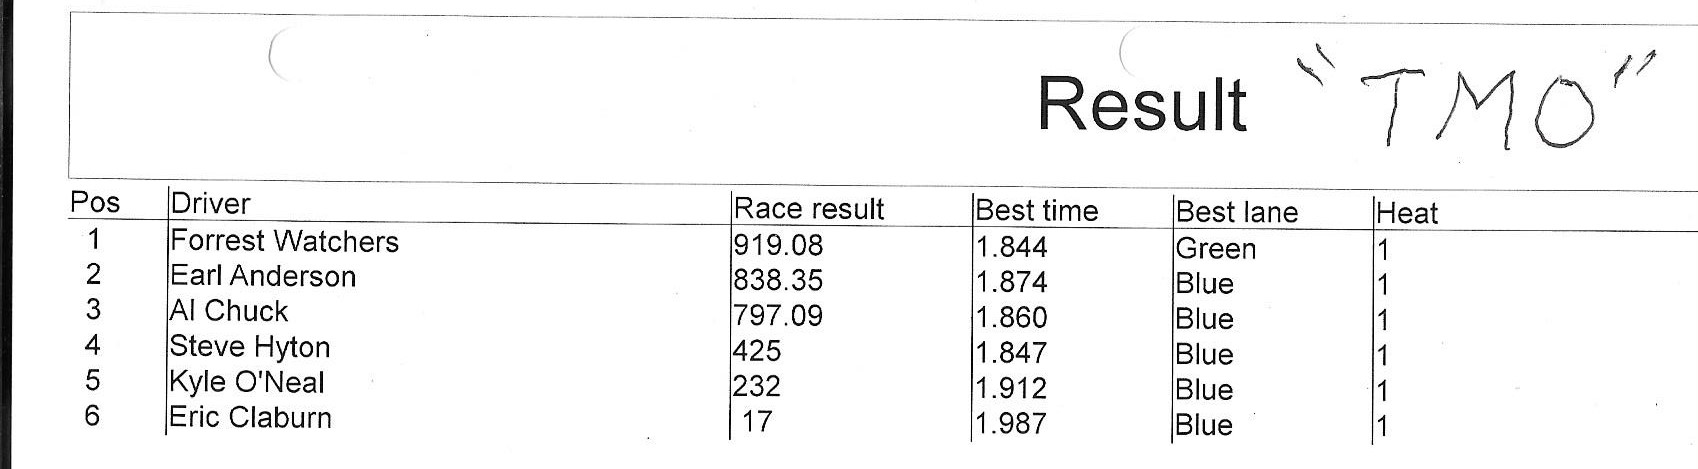 8419 tmo results.jpeg